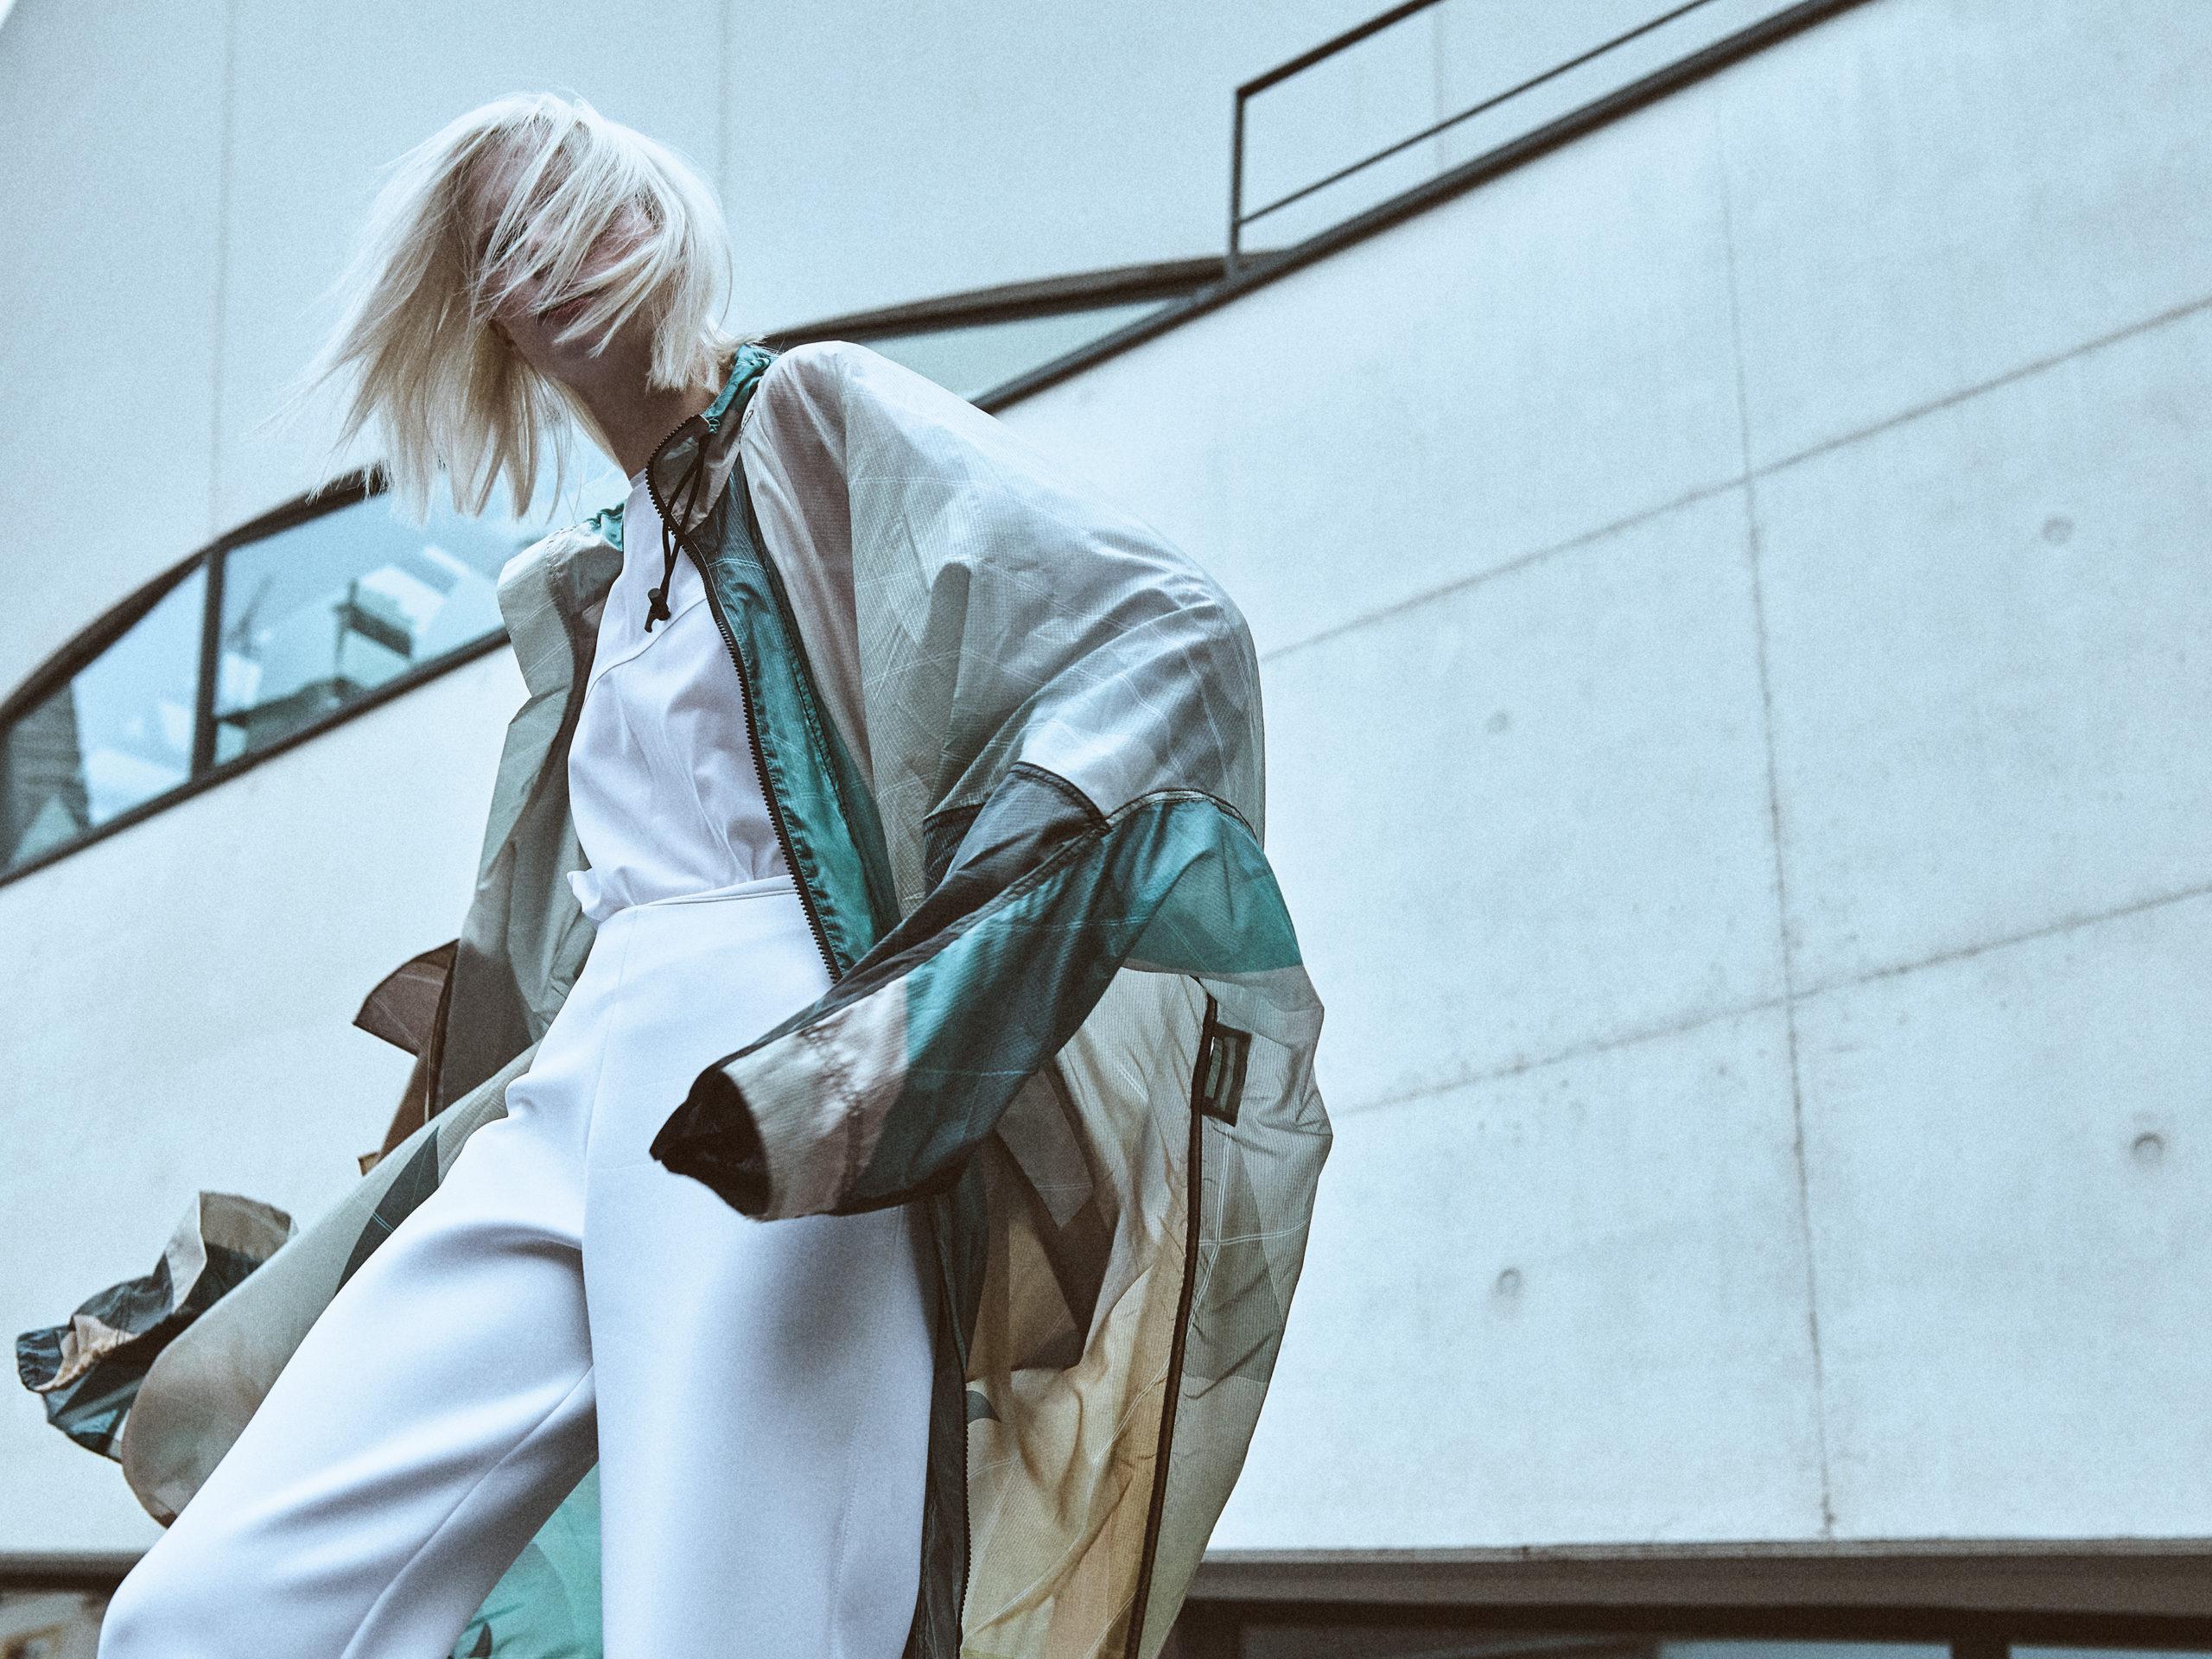 MARINE HENRION ®   Site Officiel   Créatrice de mode futuriste L'Edito Magazine - 2019